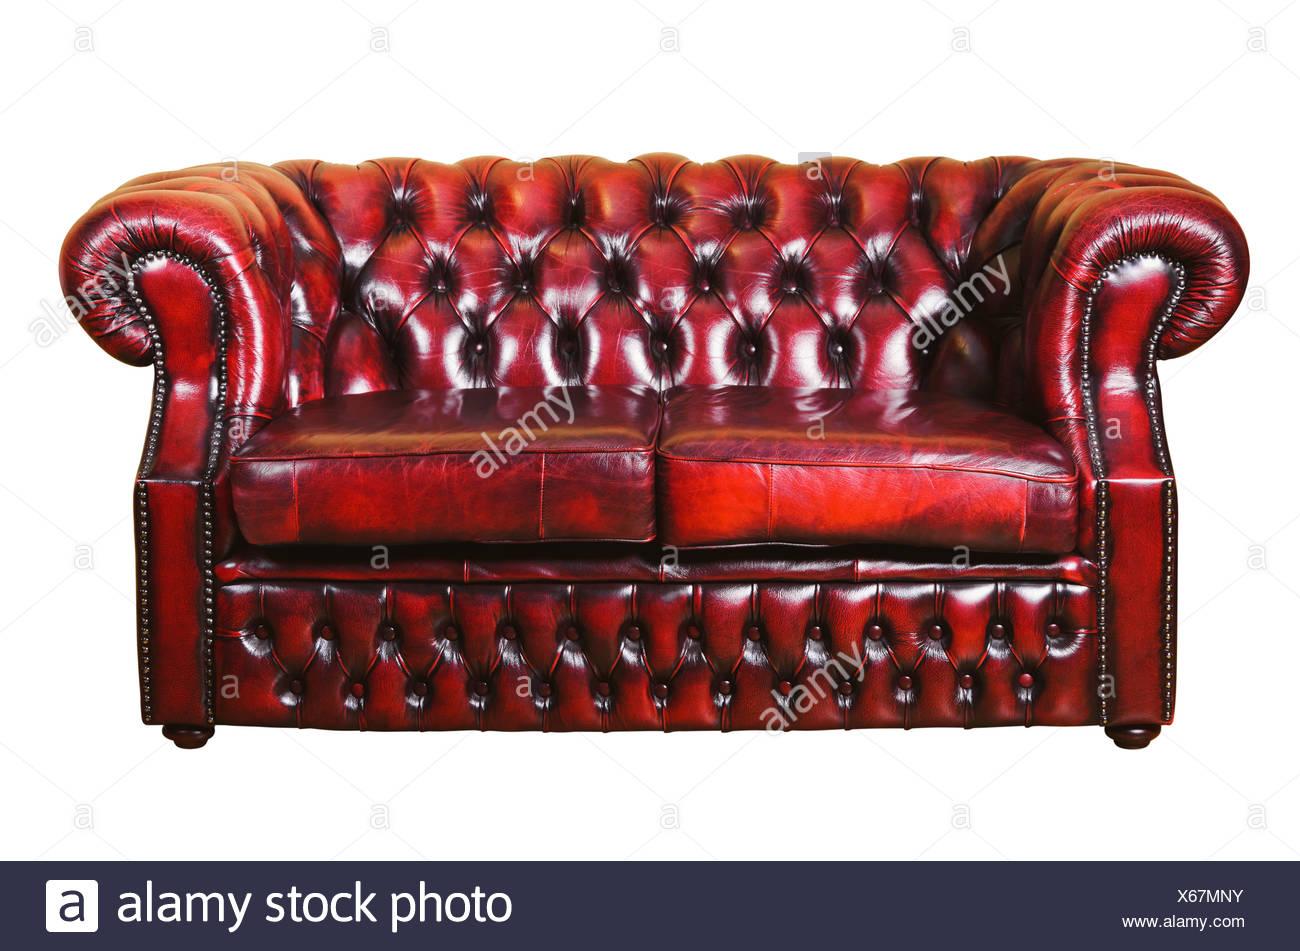 Leather Sofa - Stock Image